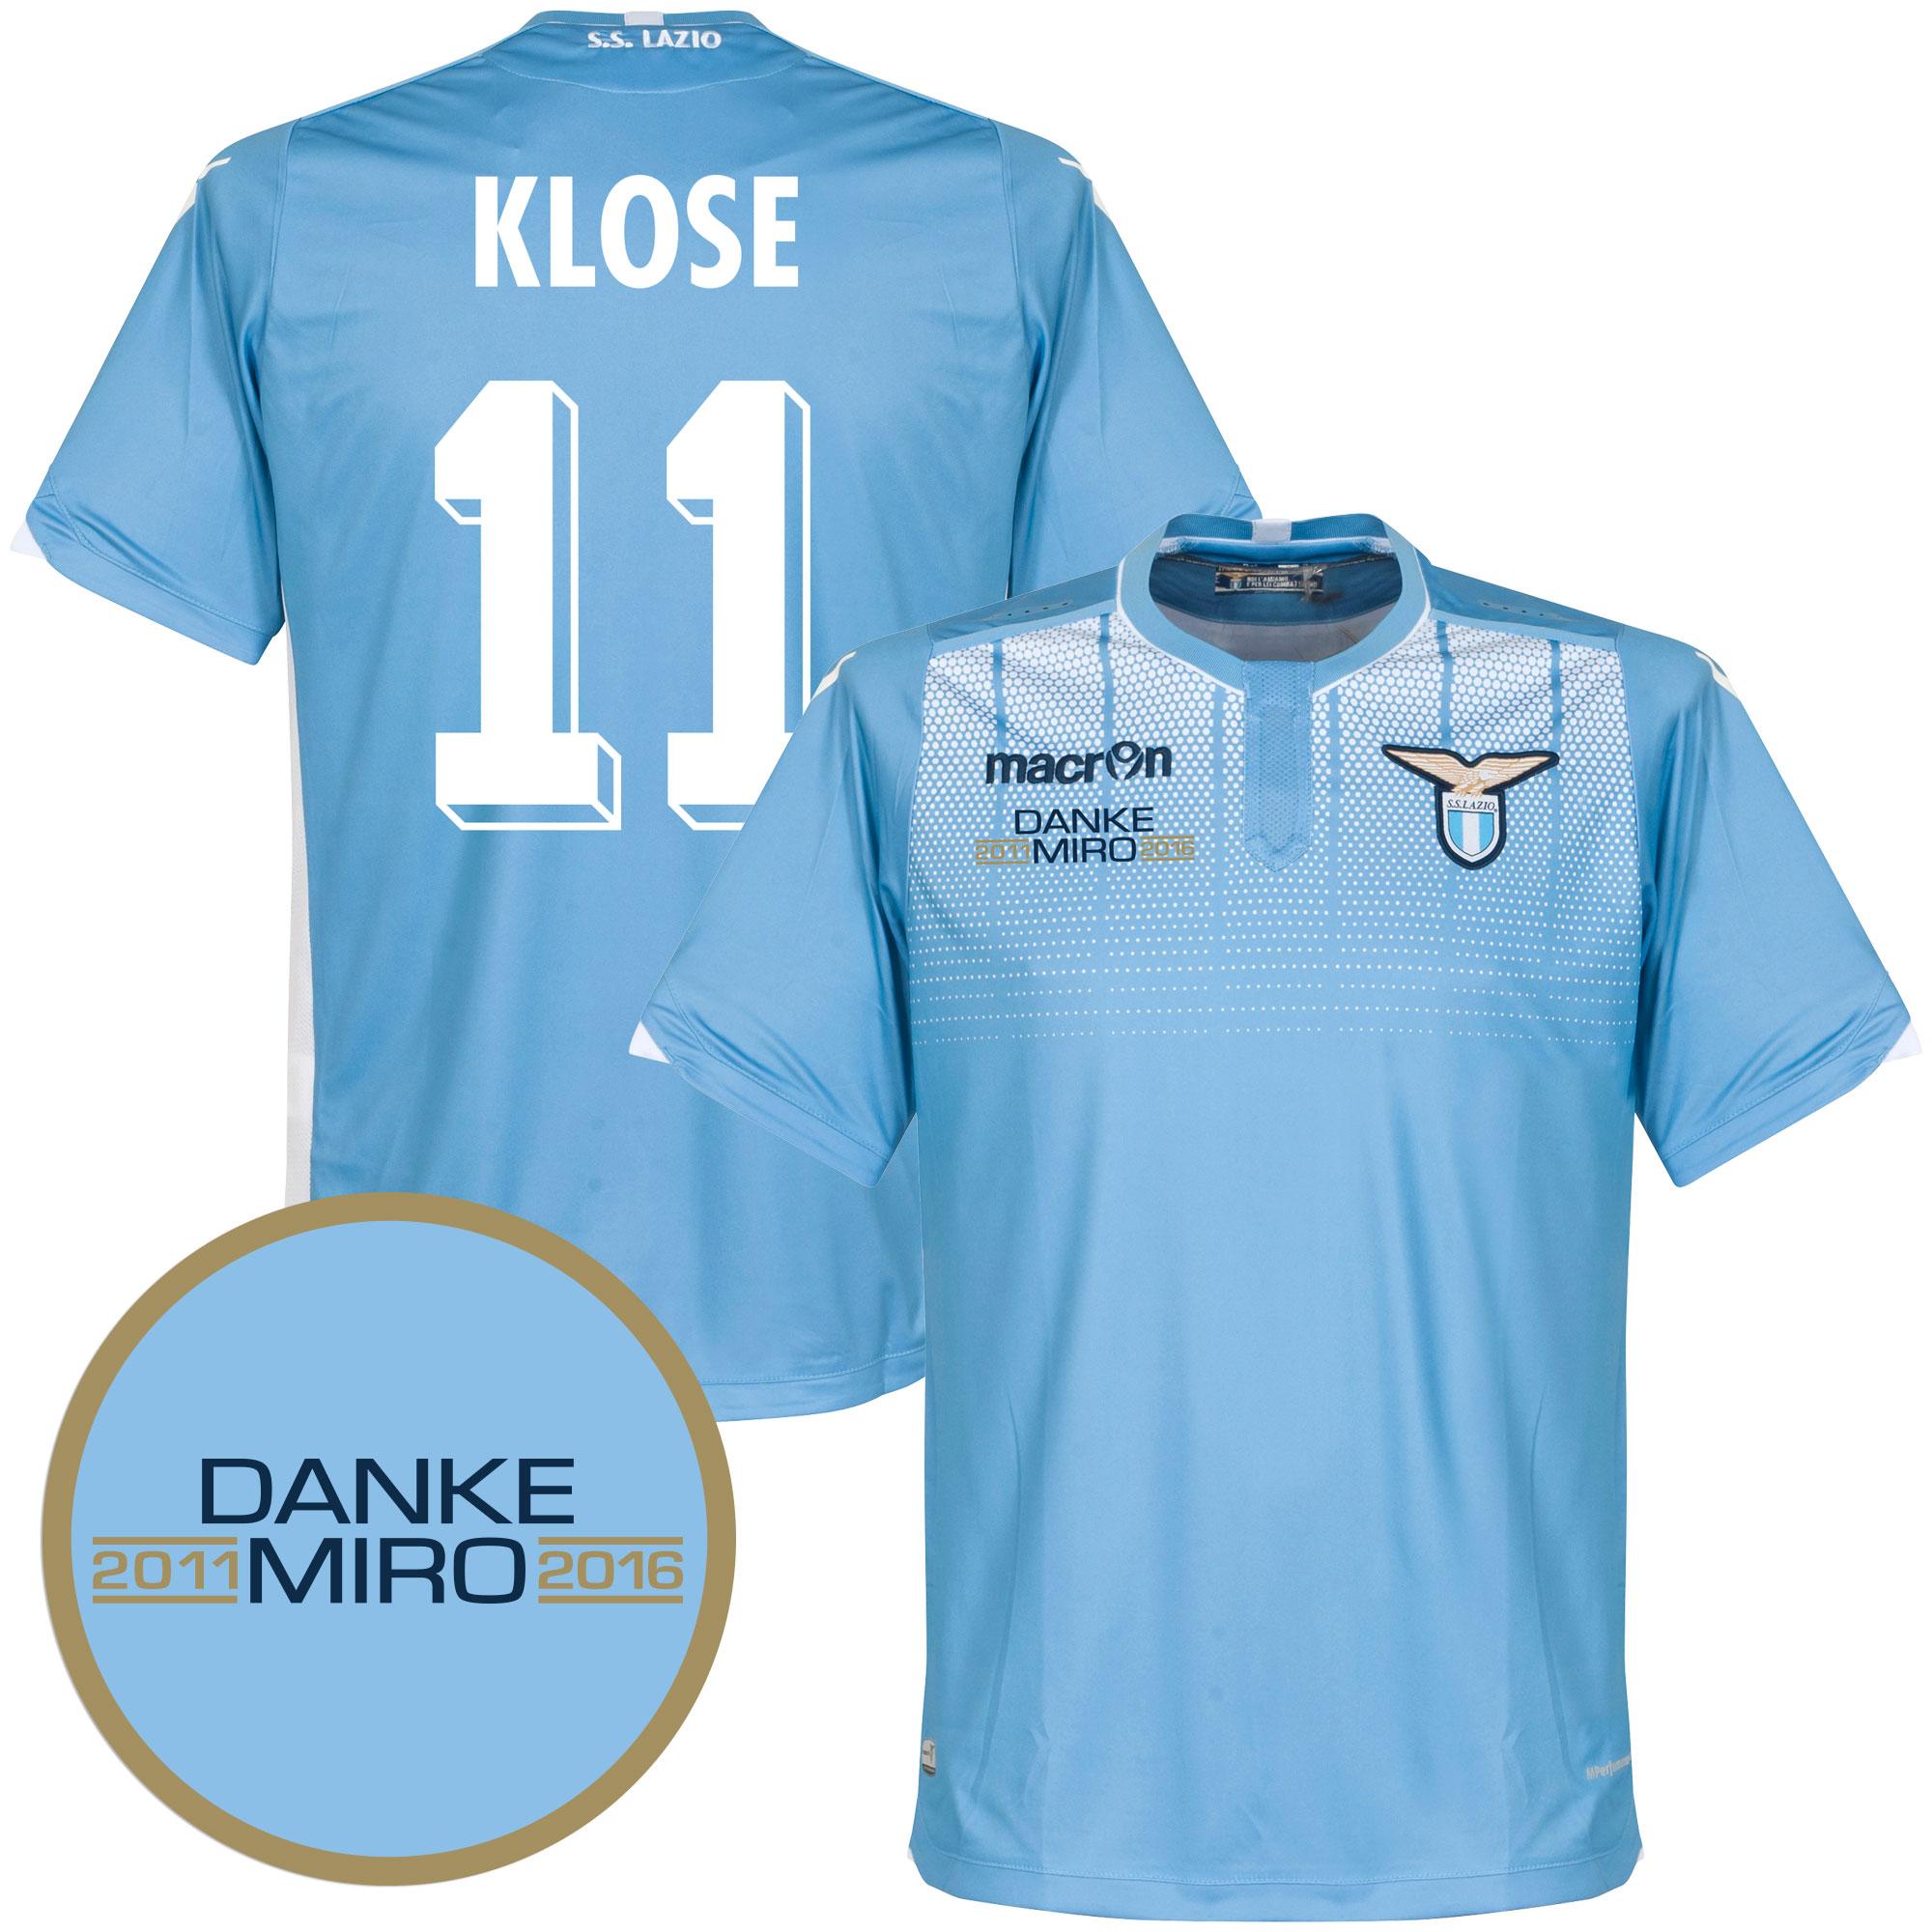 Lazio Home Klose Jersey 2015 / 2016 (Fan Style Printing) - XXL